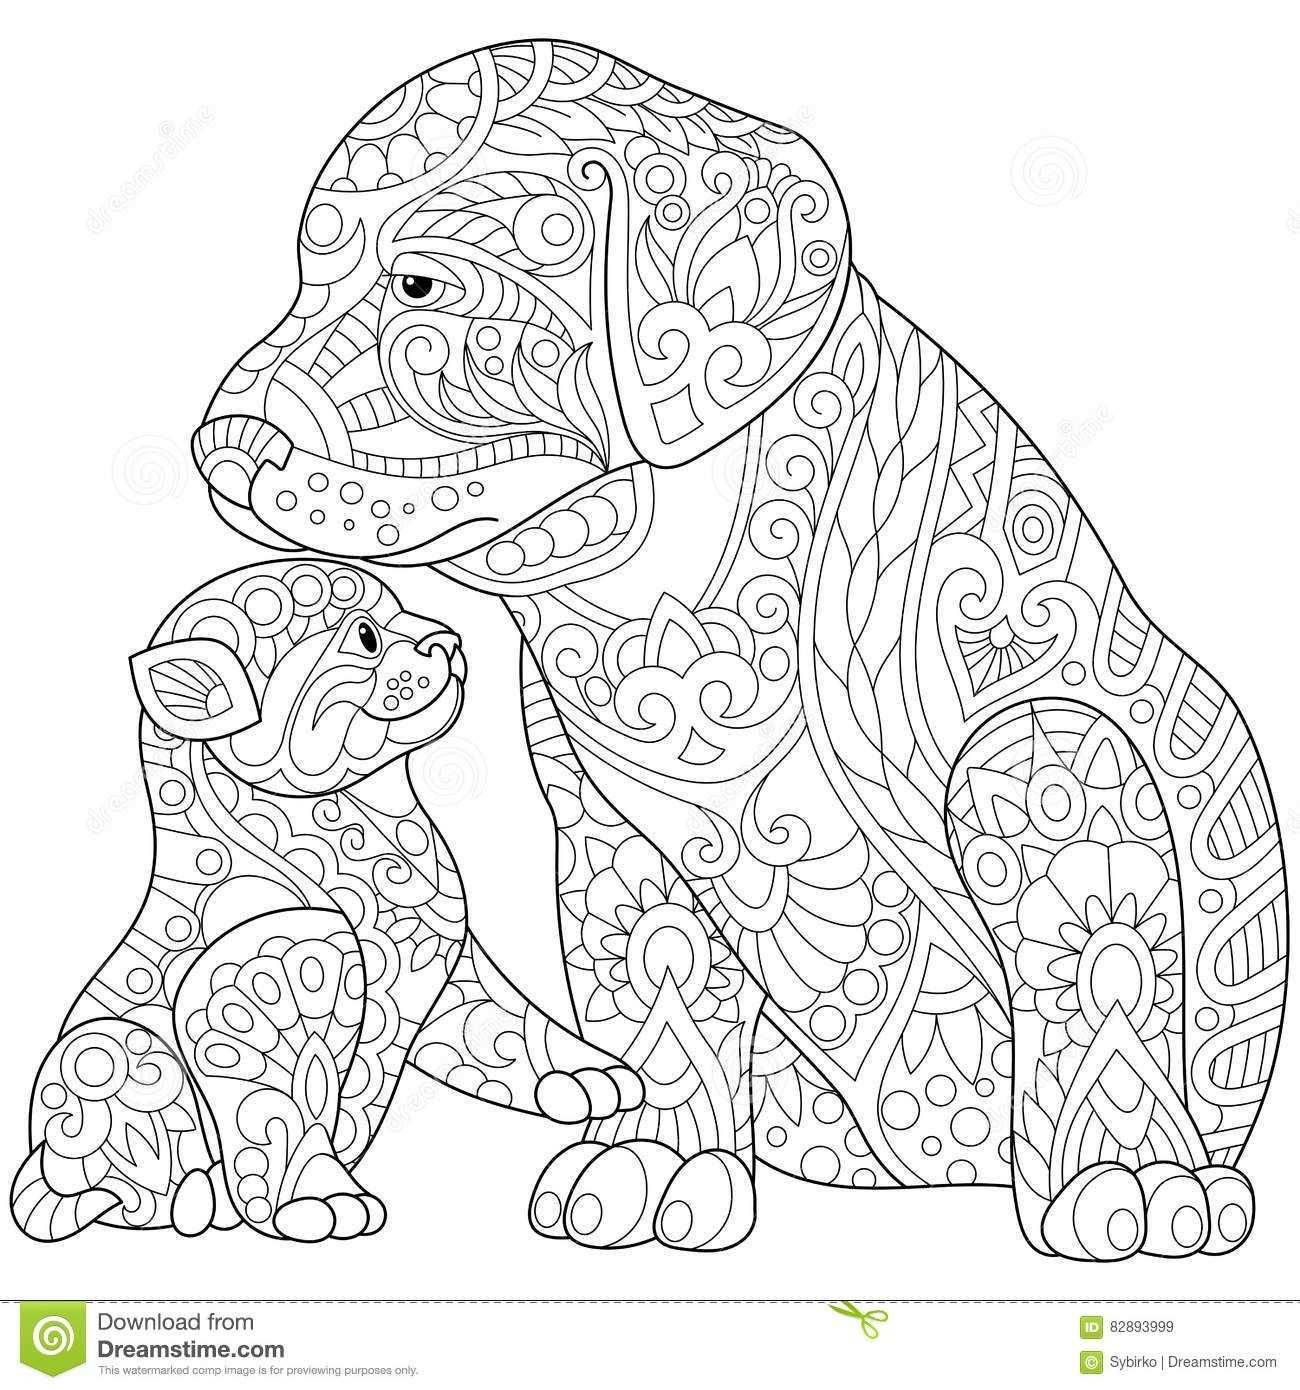 Zentangle Dachshund Dog Dieren Kleurplaten Mandala Kleurplaten